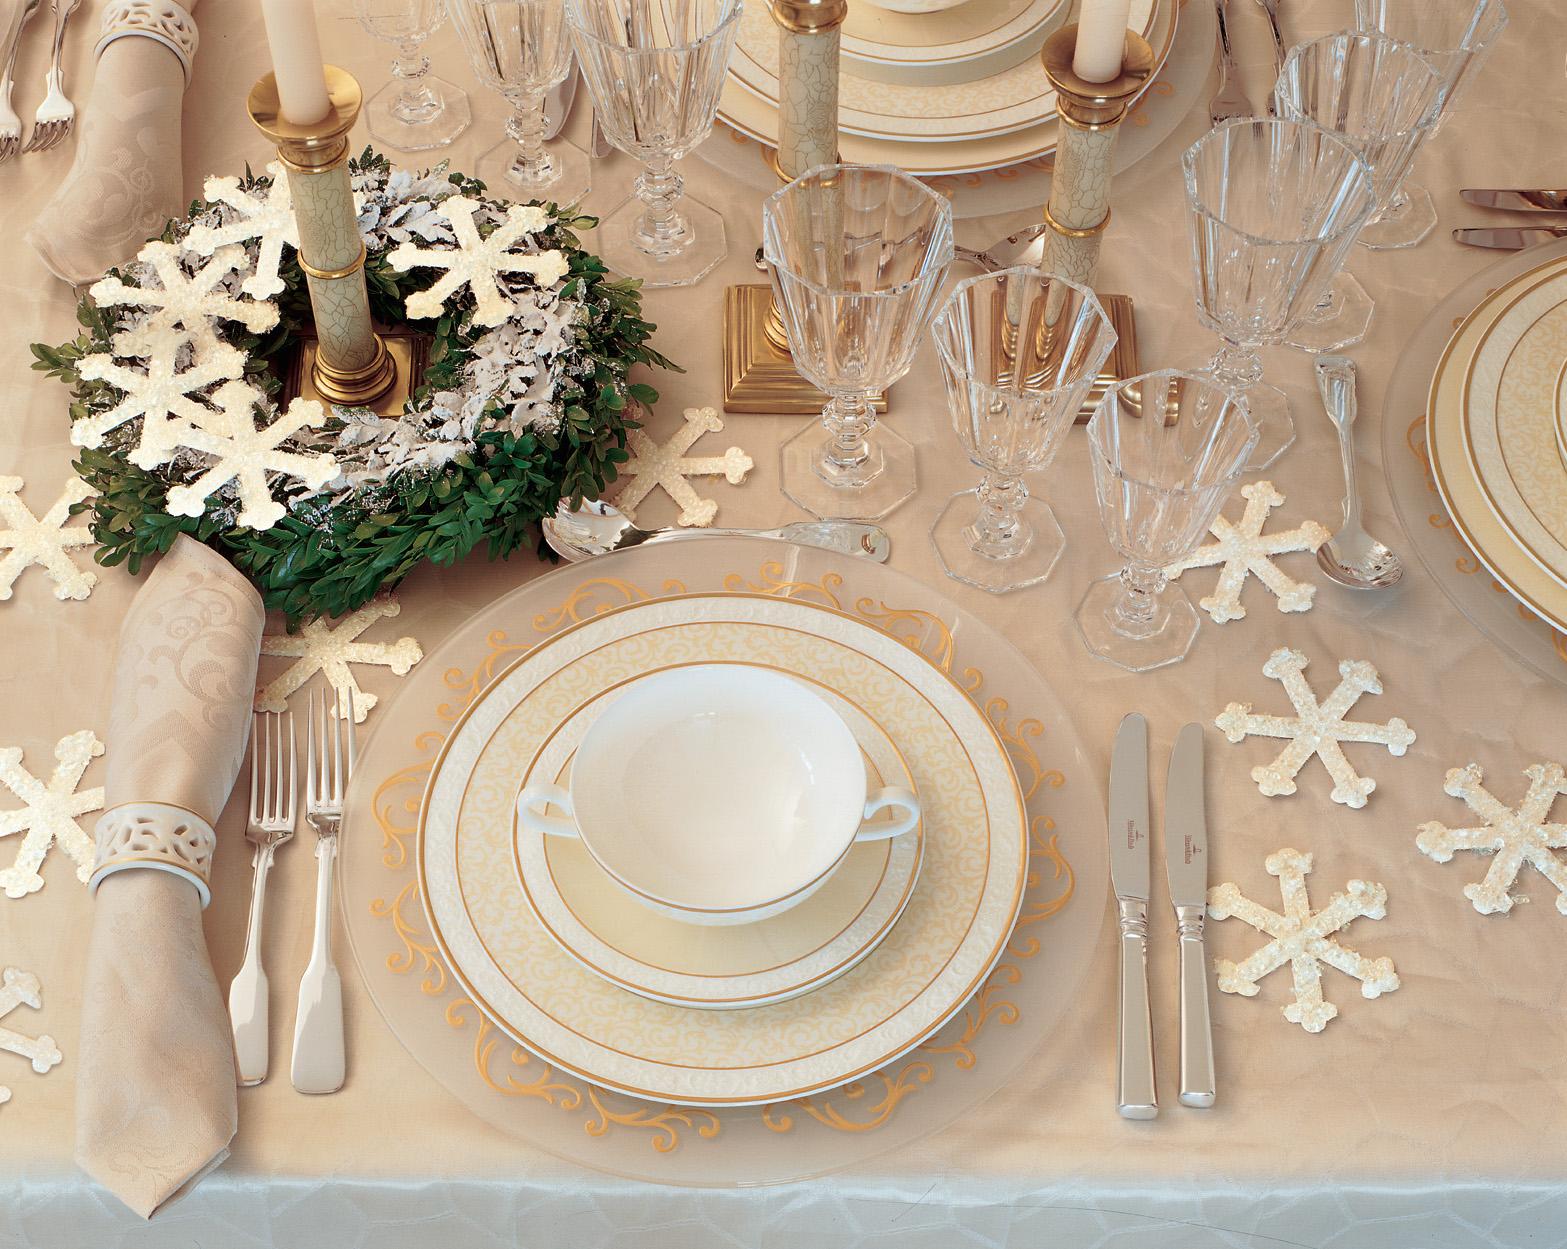 Winter Tablescape and Centerpieces Decorations Ideas-impressive-idea-christmas-wedding-decoration-ideas